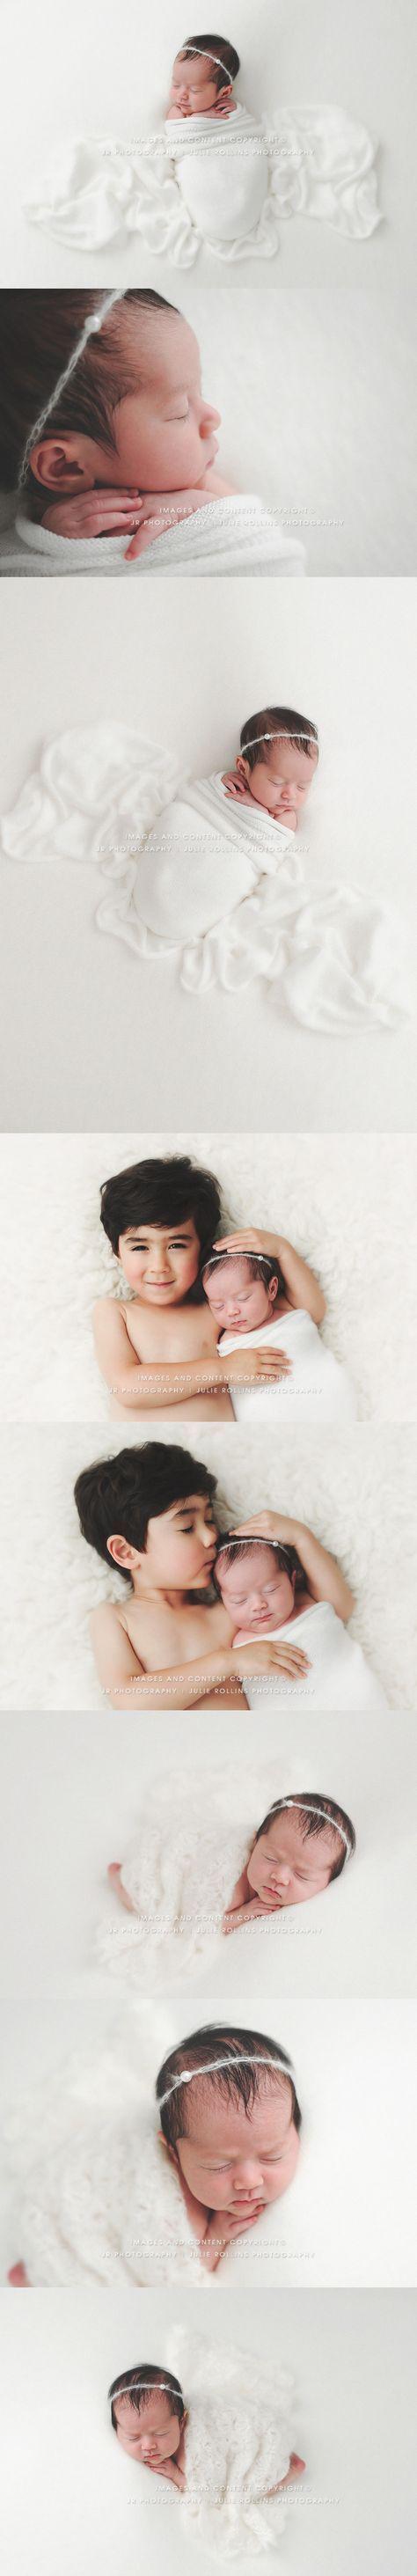 Newborn Baby Photography, neutral white, sibling newborn